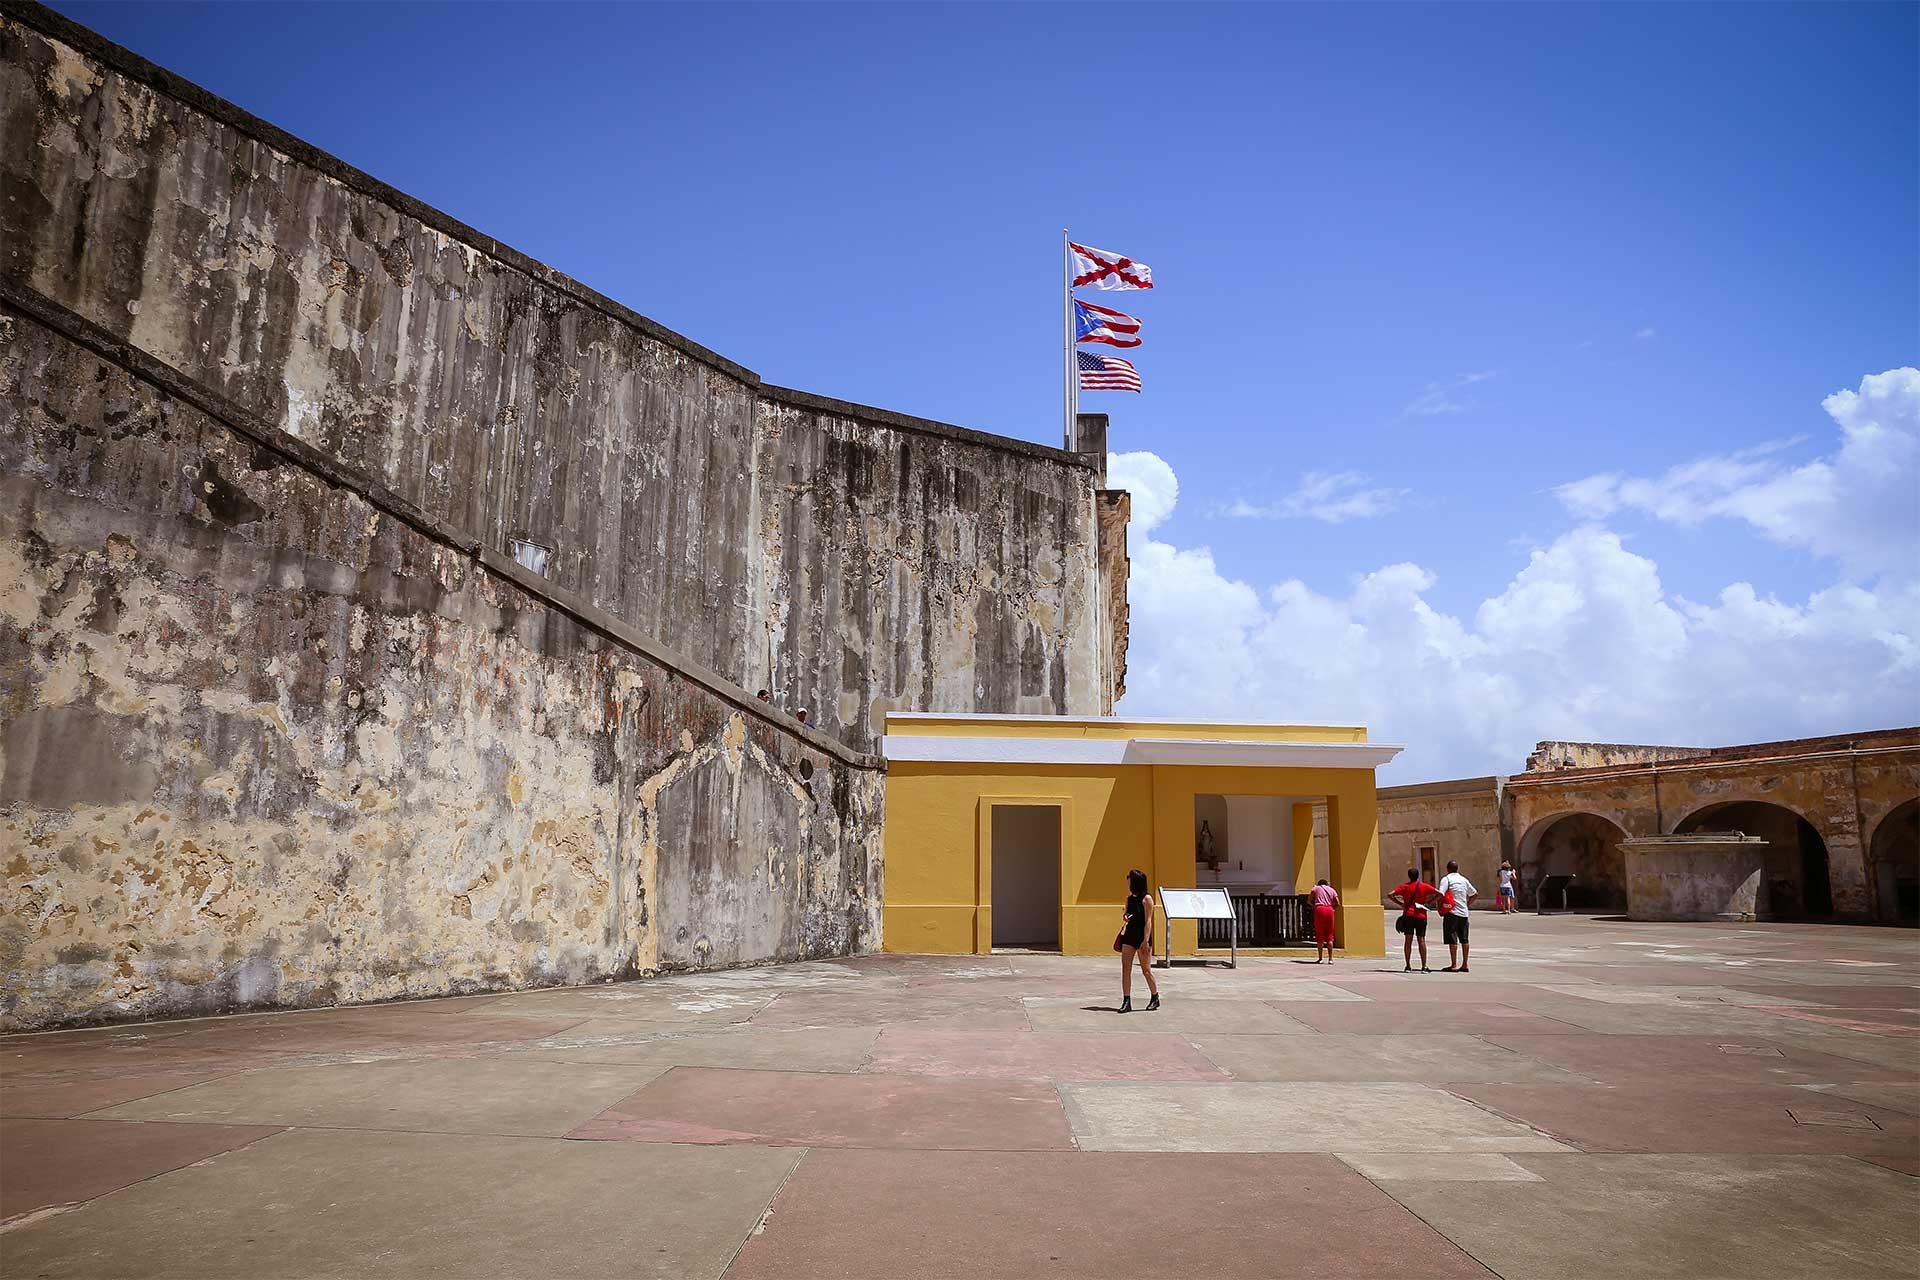 Puertorico itinerary, isla verde, puertorican cuisine, mofongo, travel, natgeo, travelworldwide, caribbearn islands, el yunque national forest, biobay, old town sanjuan, culebra islands, flamenco beach, Puerto Rico, lonelyplanet, travellers